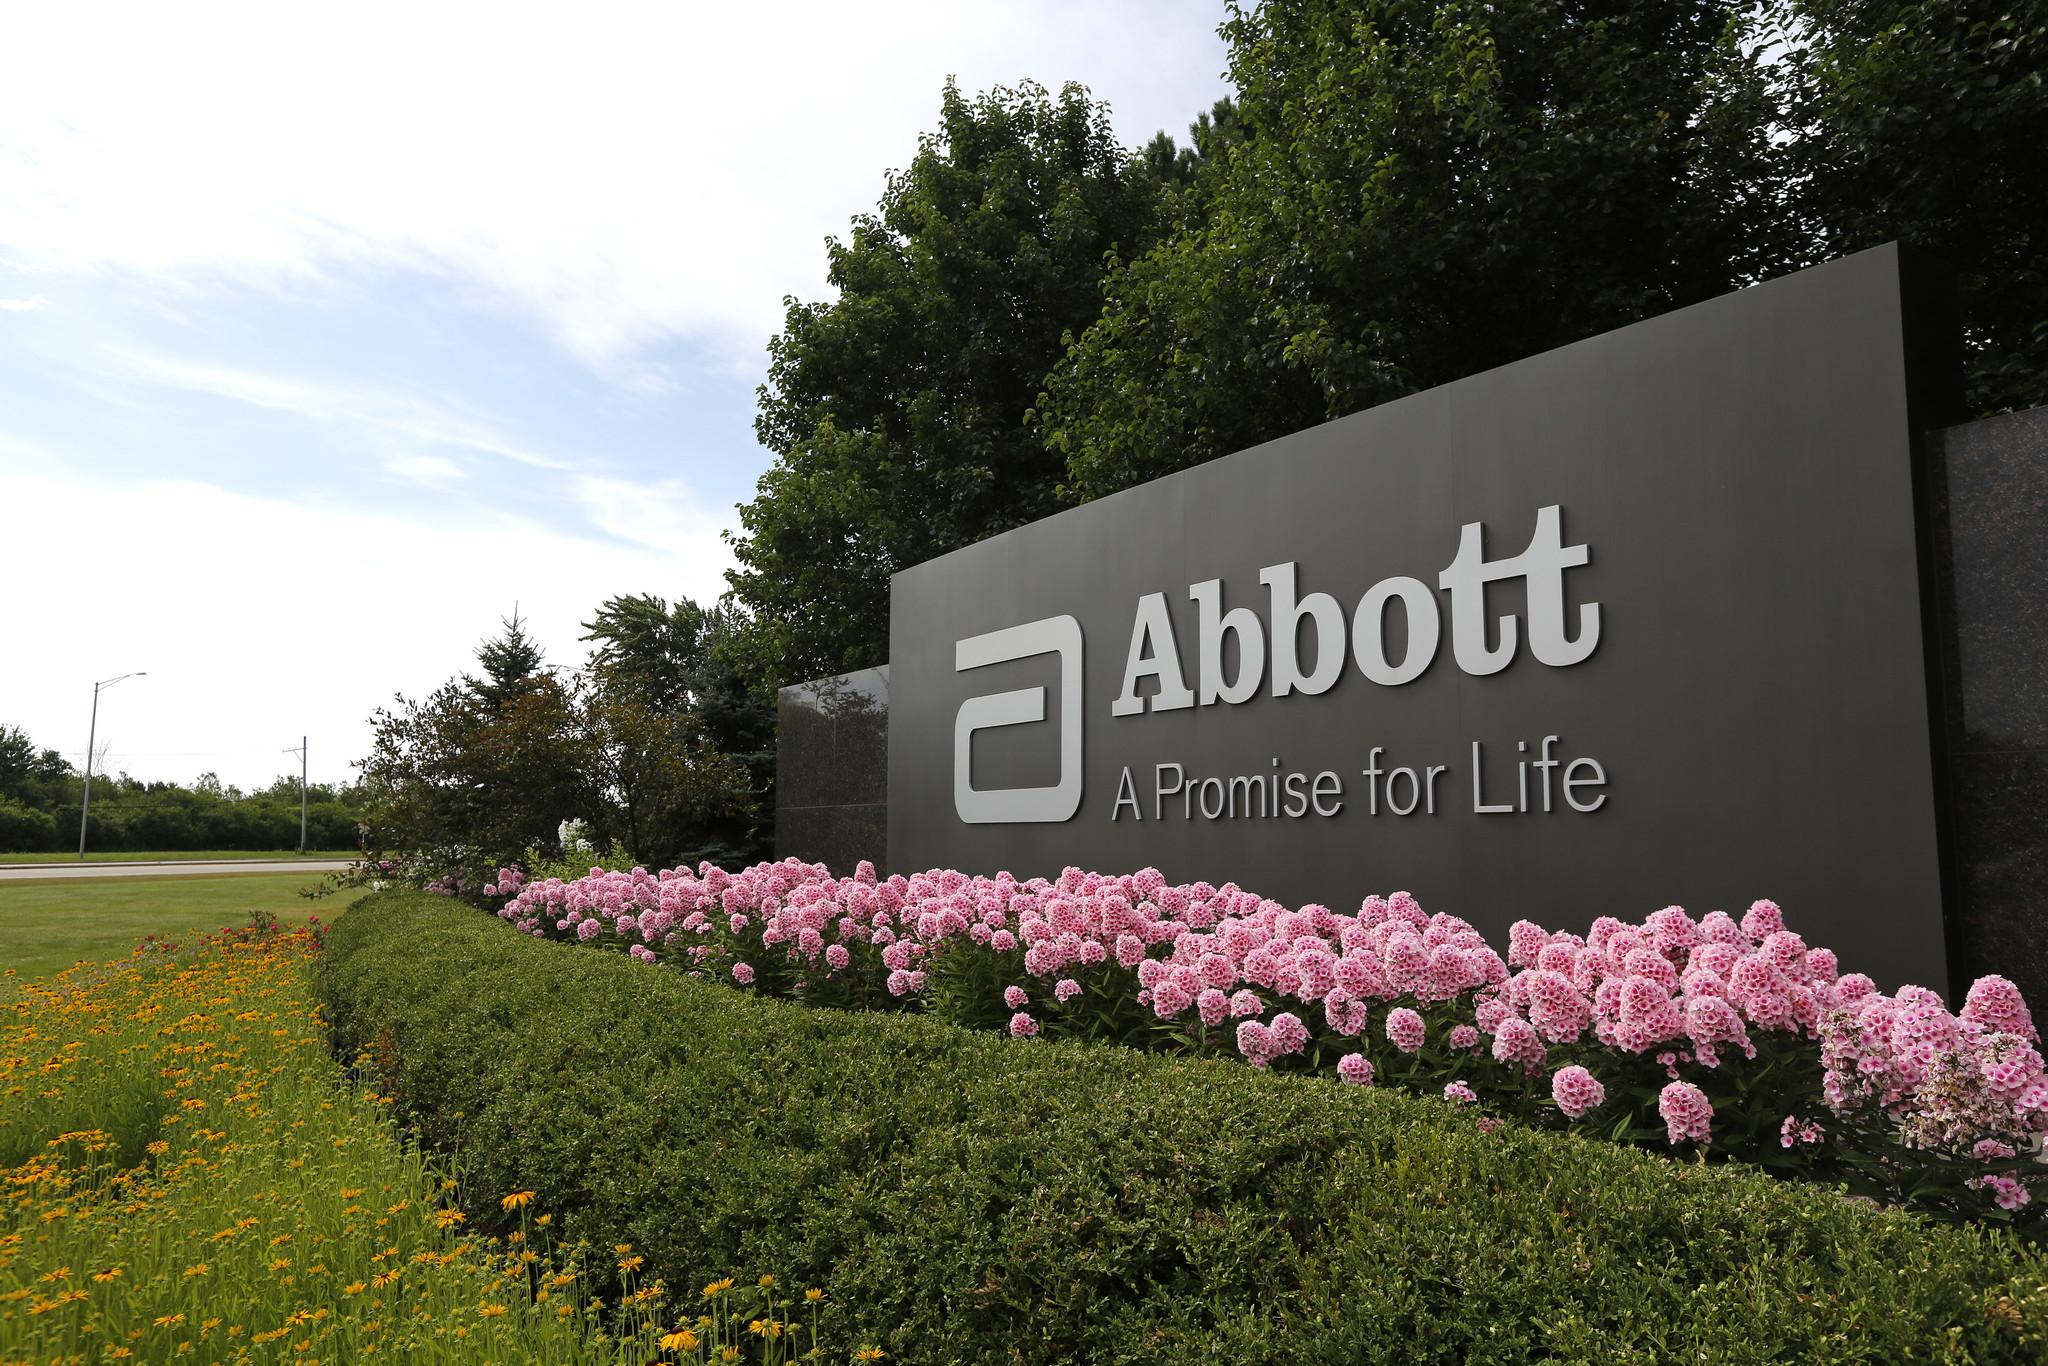 Diabetics can avoid finger pricks with new app from Abbott, Silicon Valley partner